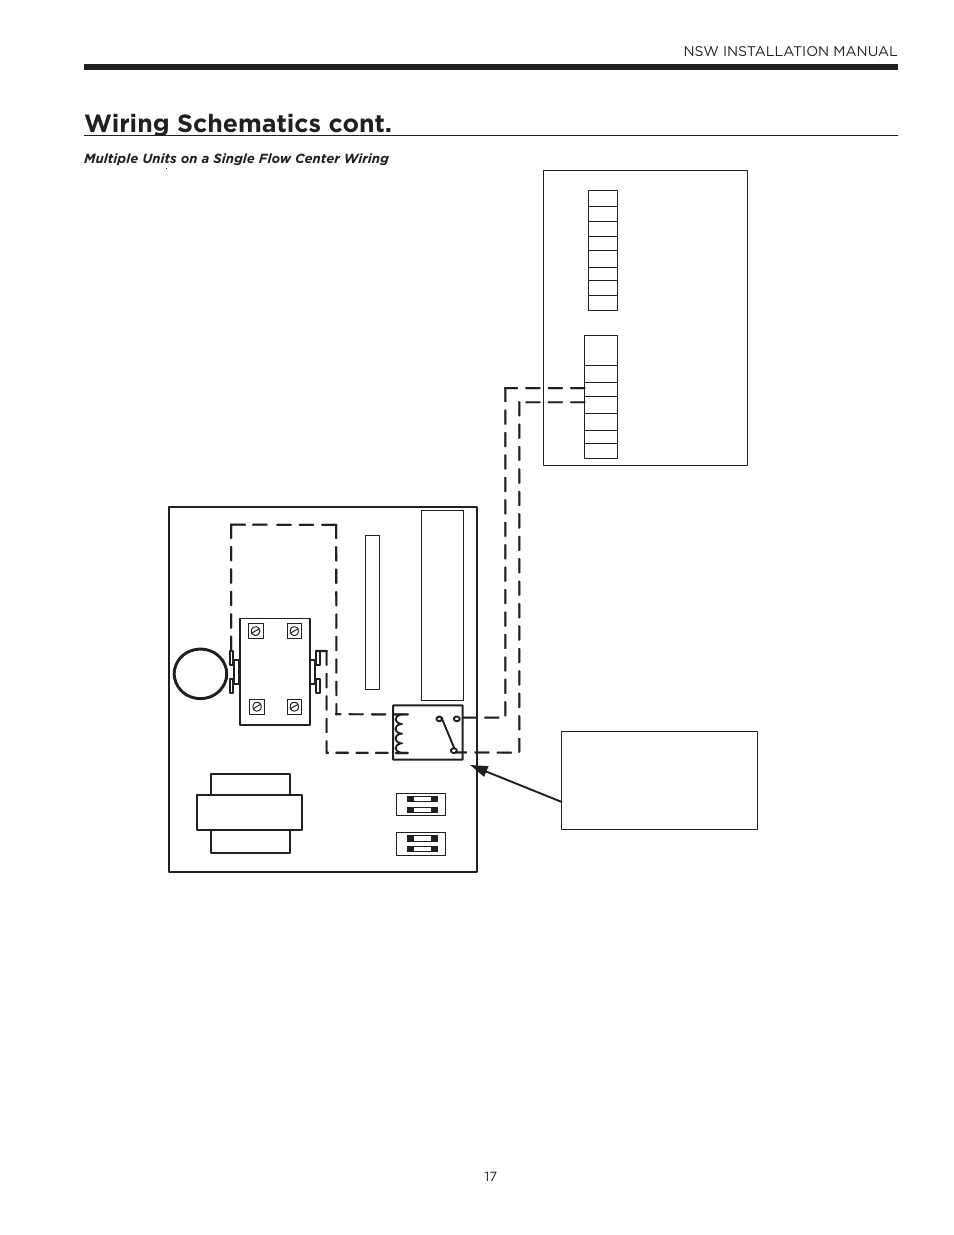 medium resolution of wiring schematics cont nsw installation manual waterfurnace water furnace wiring diagram